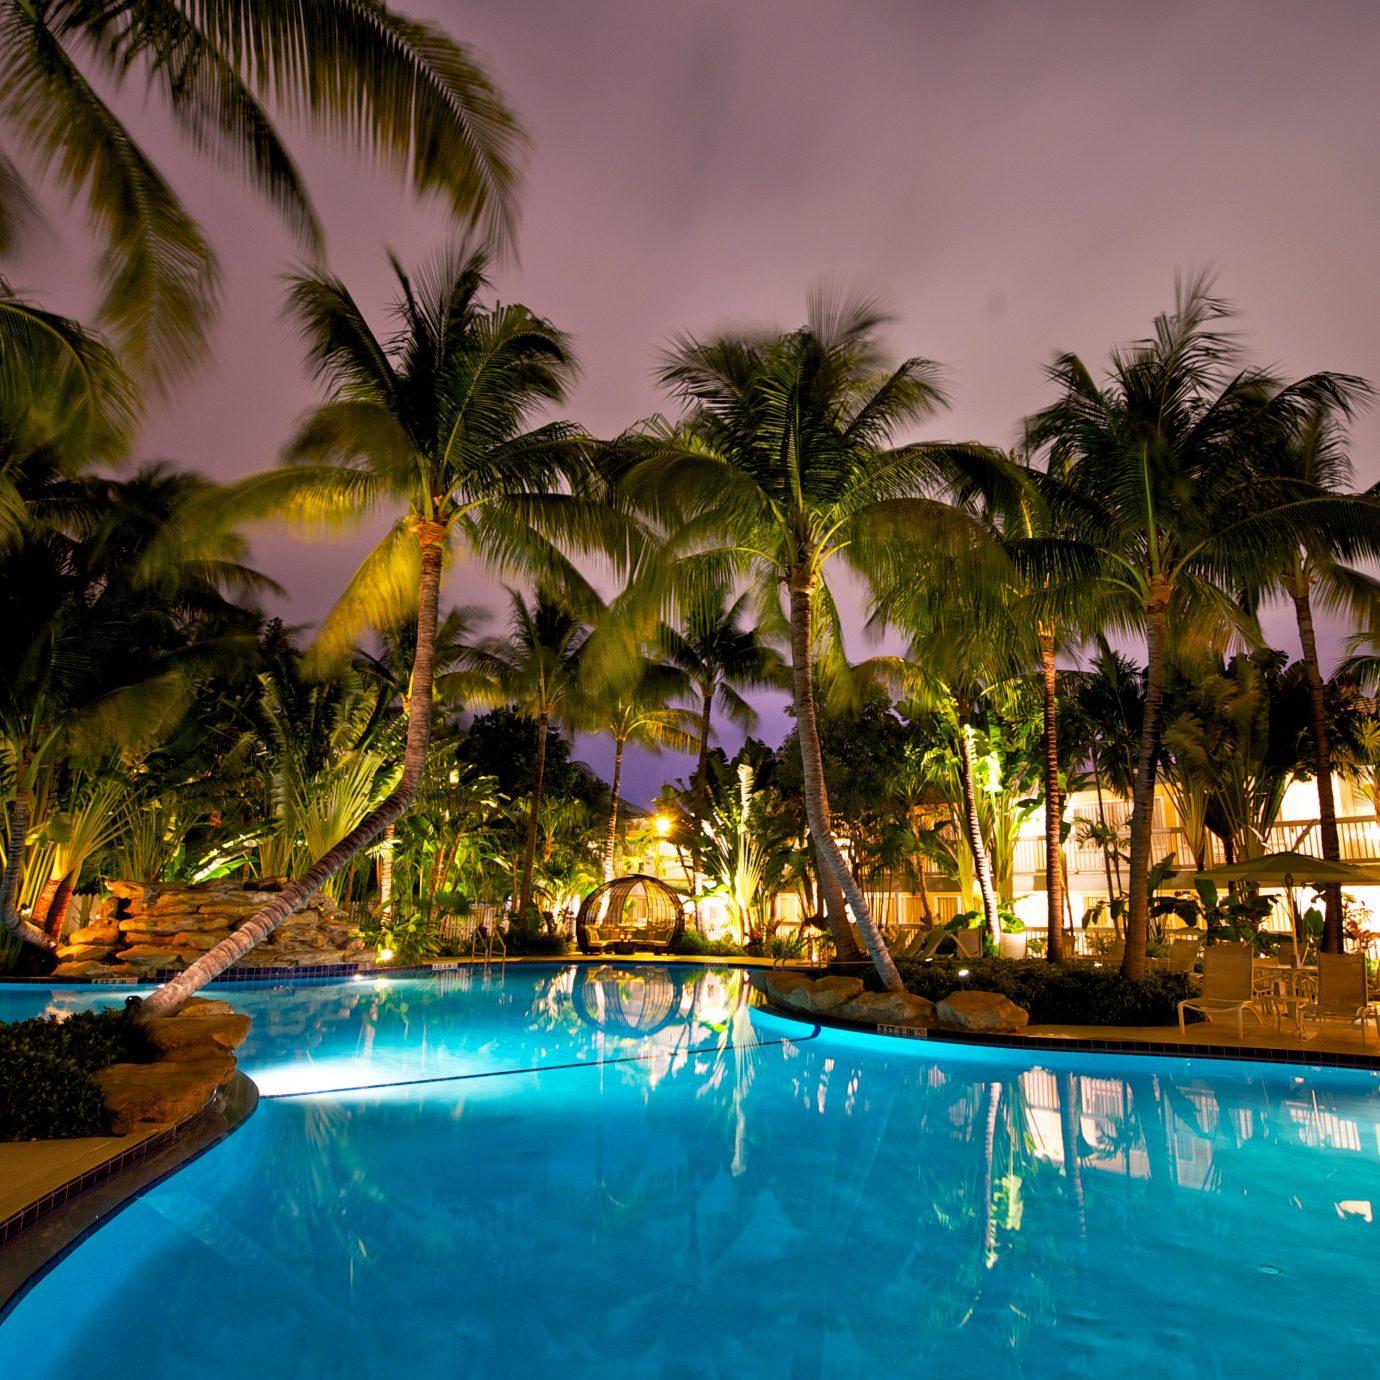 Inn Lounge Patio Pool Terrace tree palm water Resort swimming pool night caribbean arecales tropics Lagoon plant lined swimming